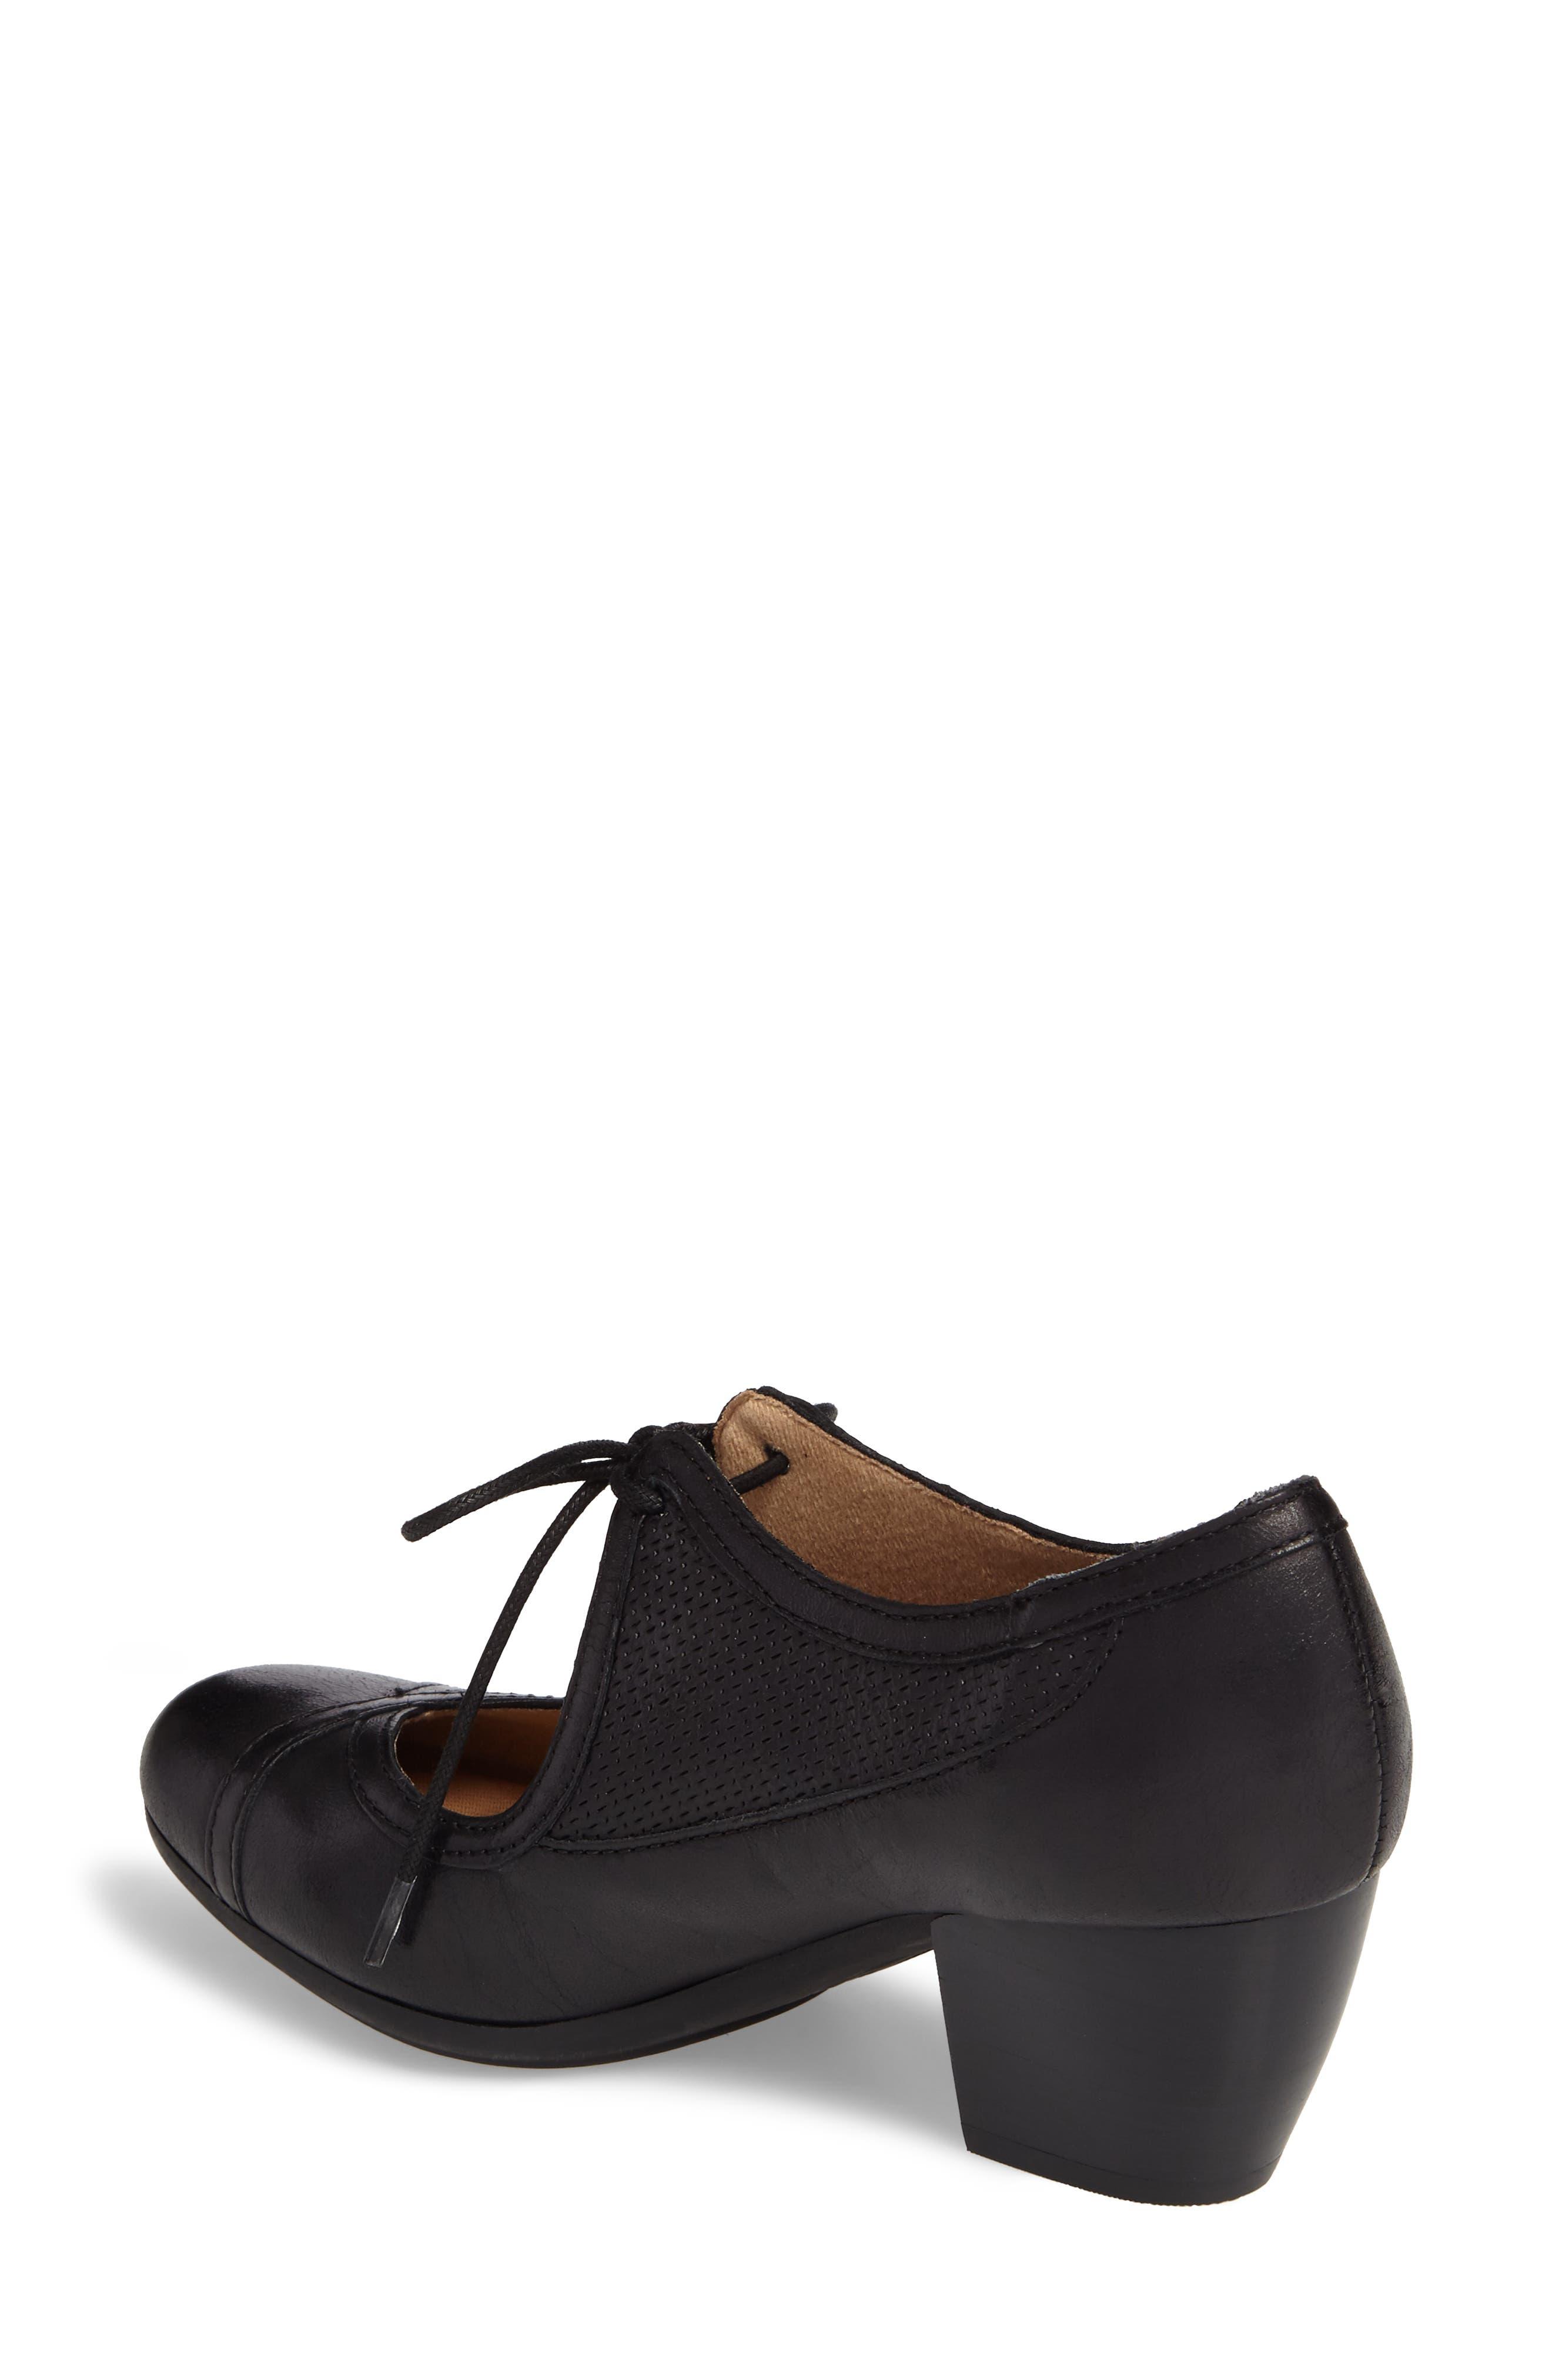 Almyra Pump,                             Alternate thumbnail 2, color,                             Black Leather